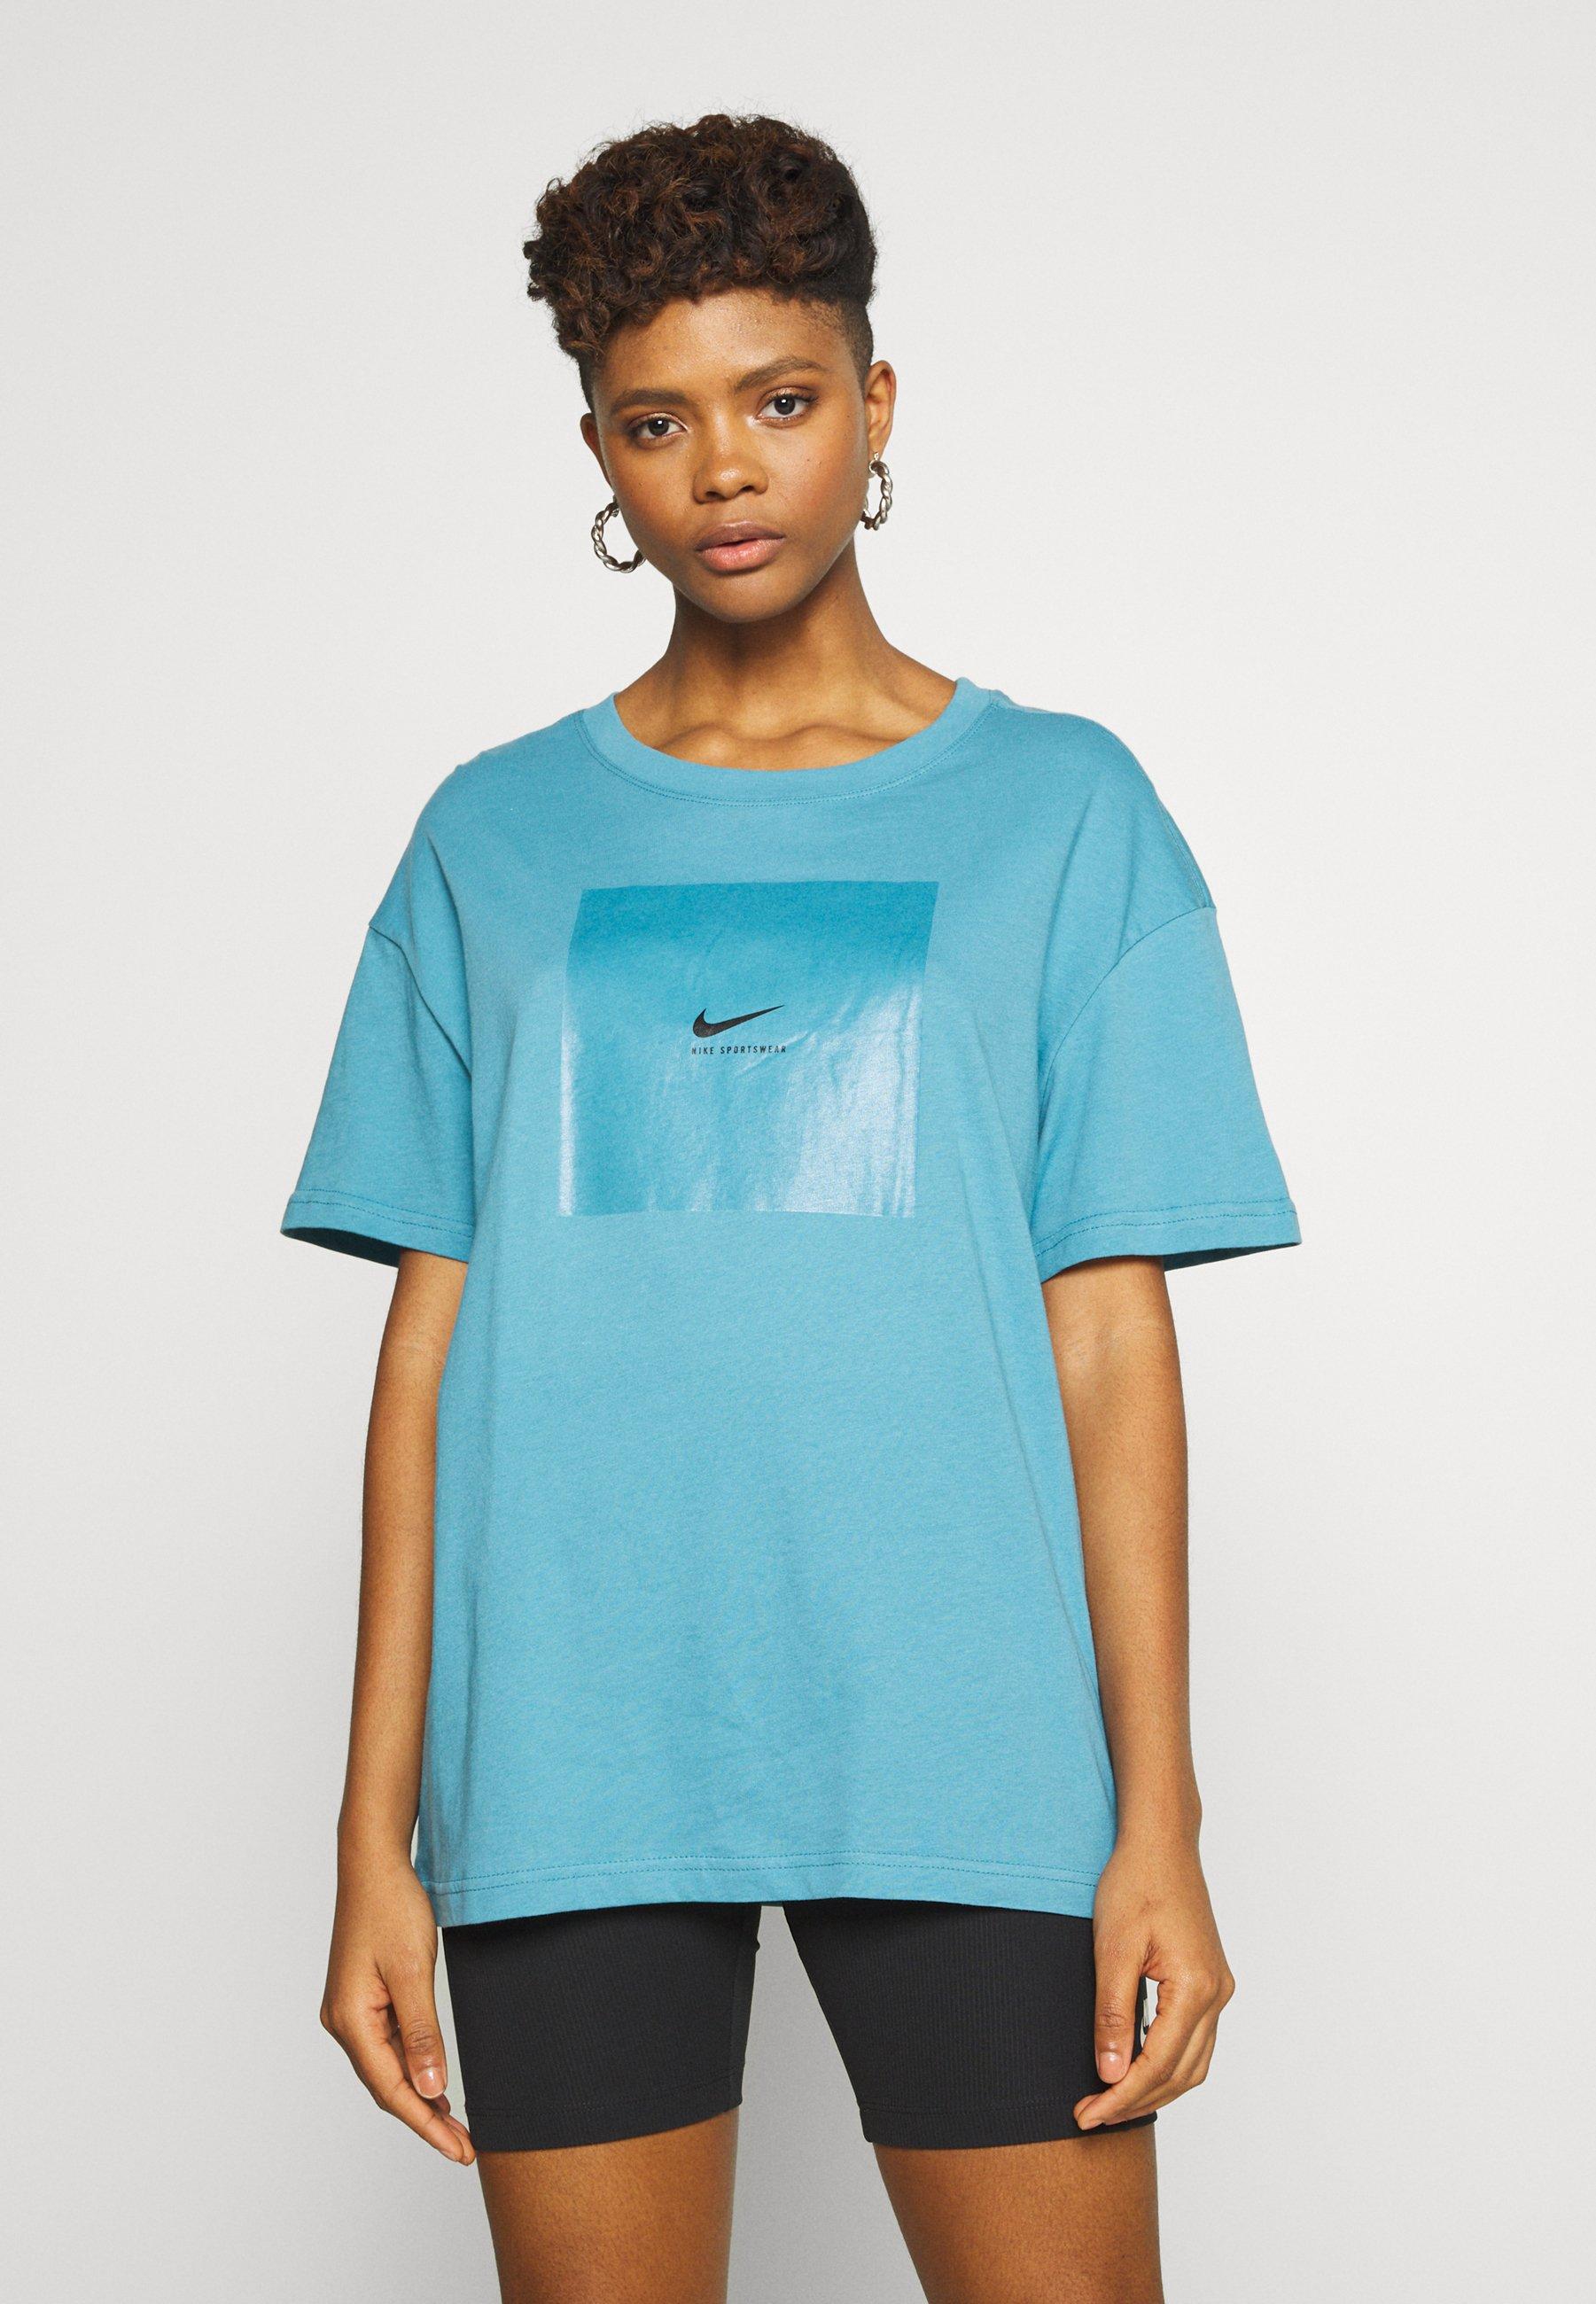 TEE OVERSIZED LUX T shirt imprimé ceruleanblack